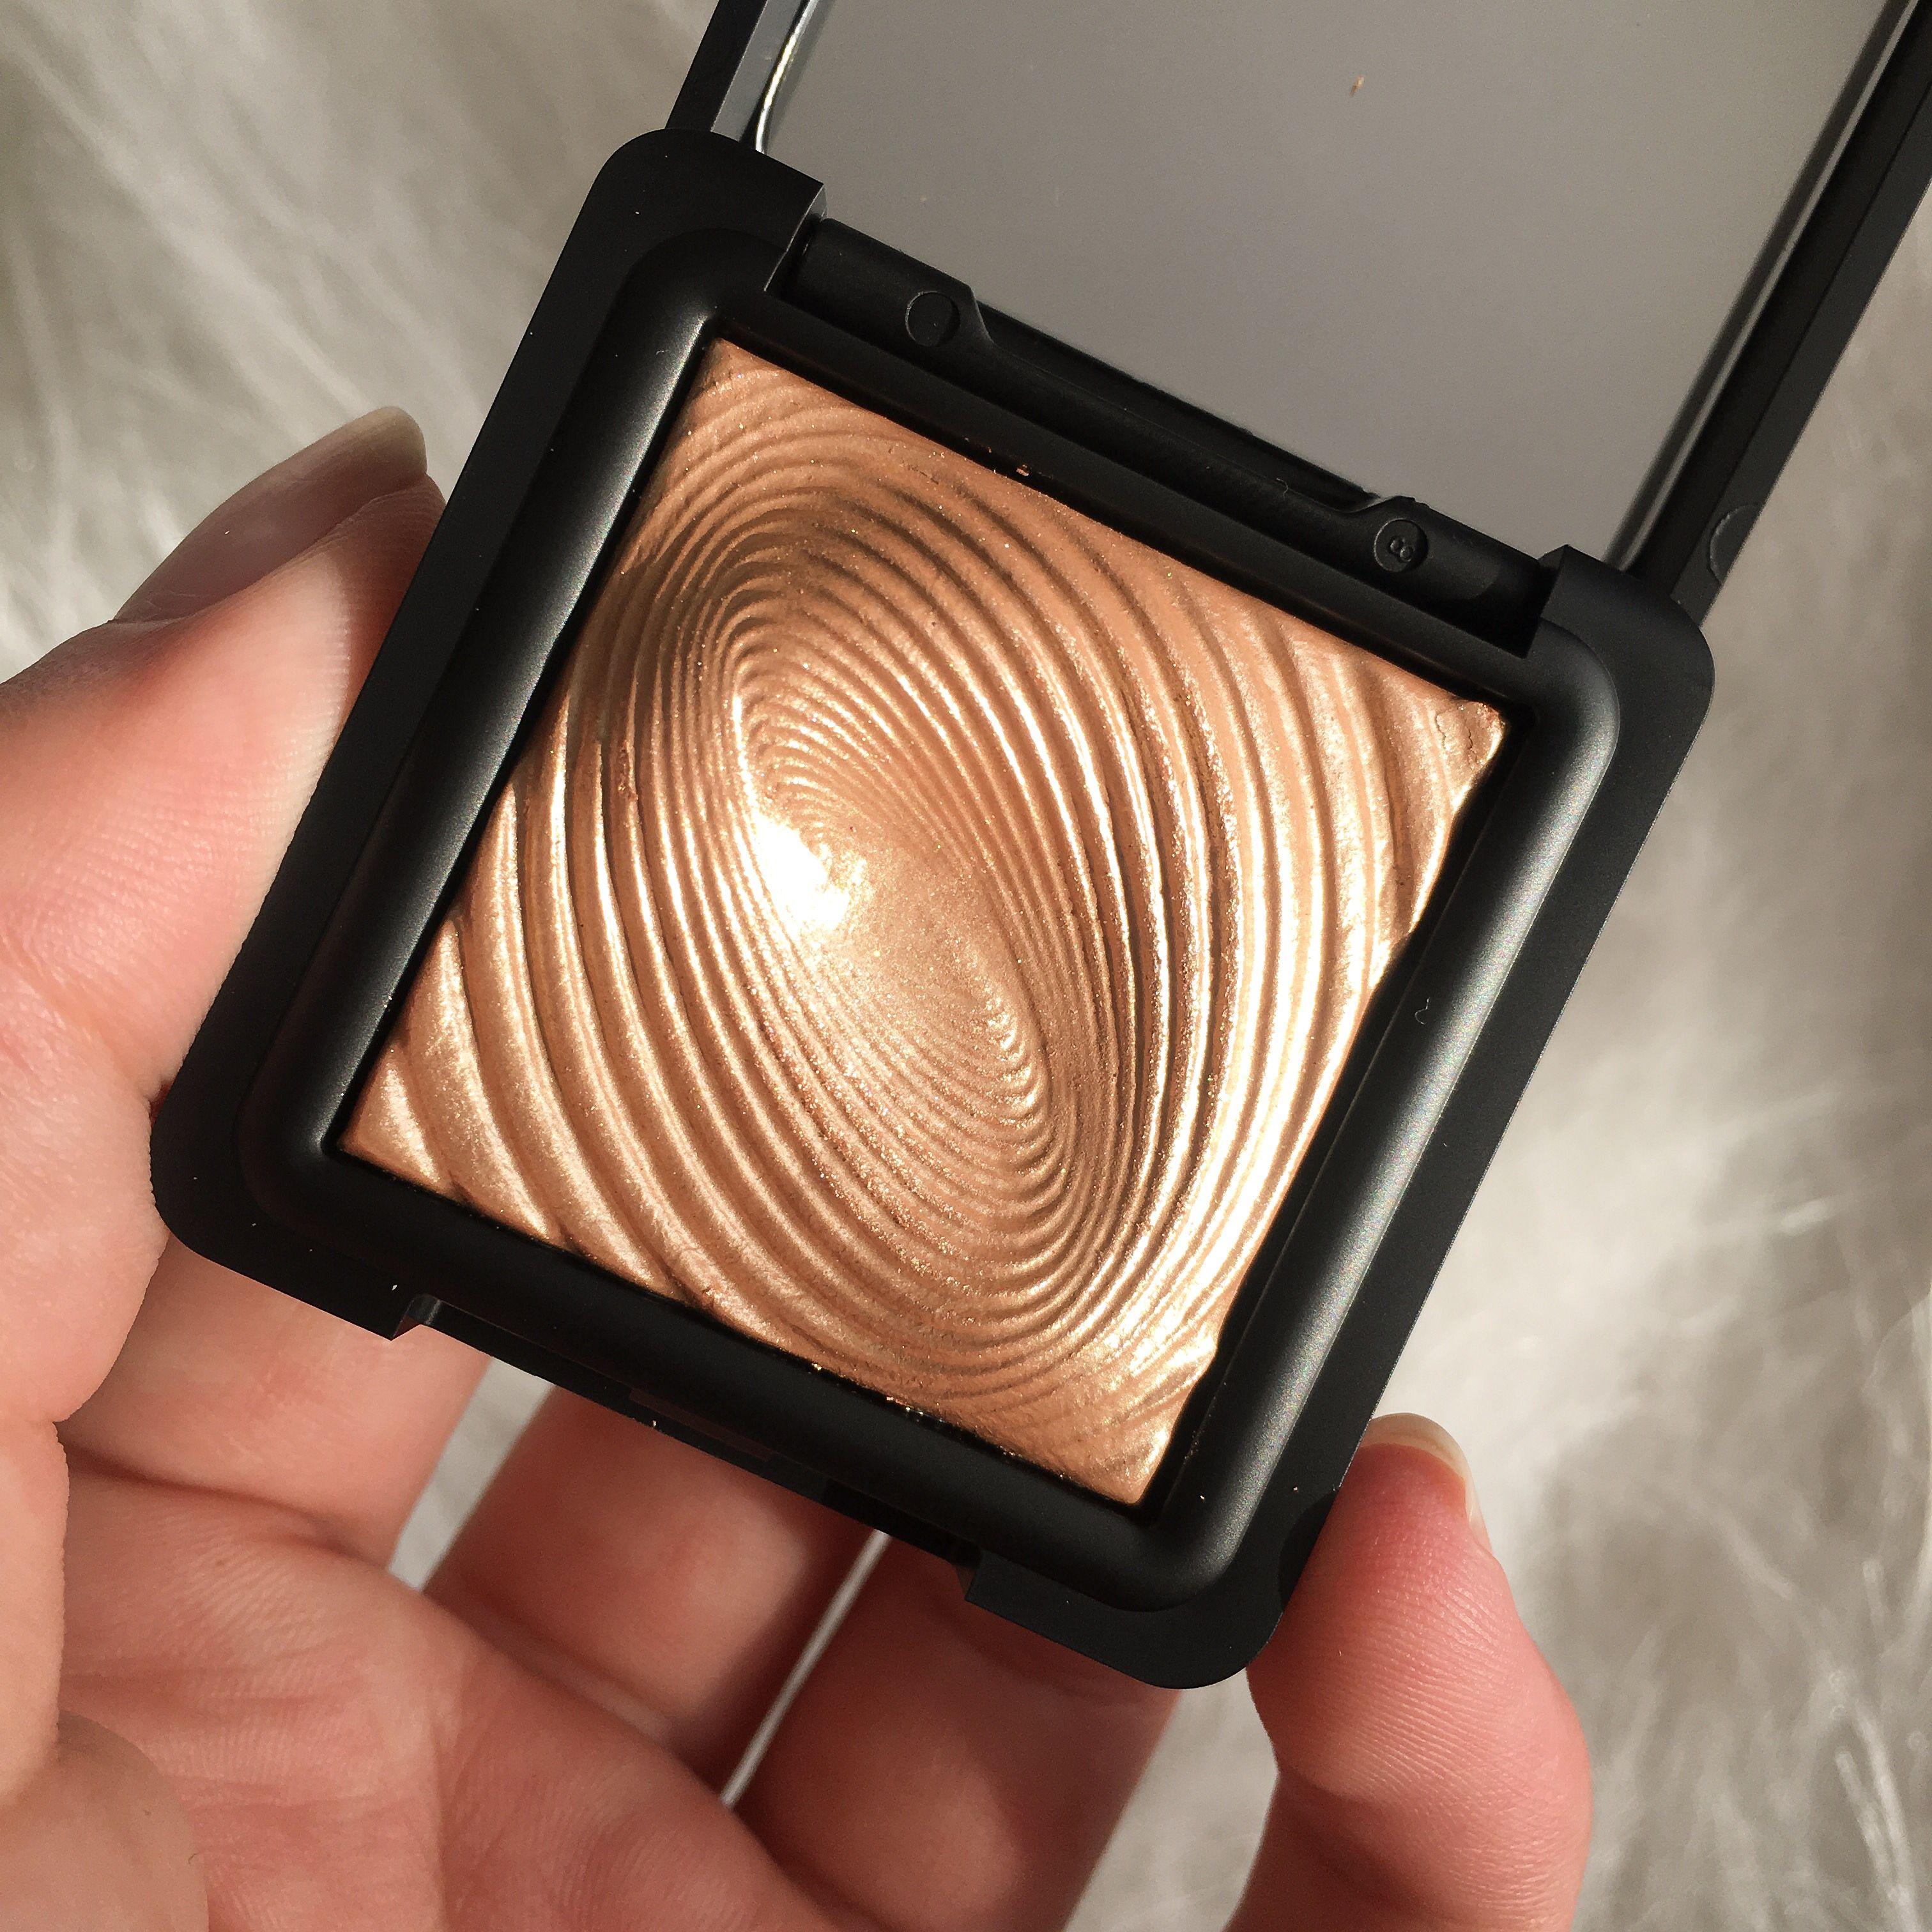 Calendrier Kiko.Kiko Milano Water Eyeshadow In Shade 208 Makeup Loving 2019